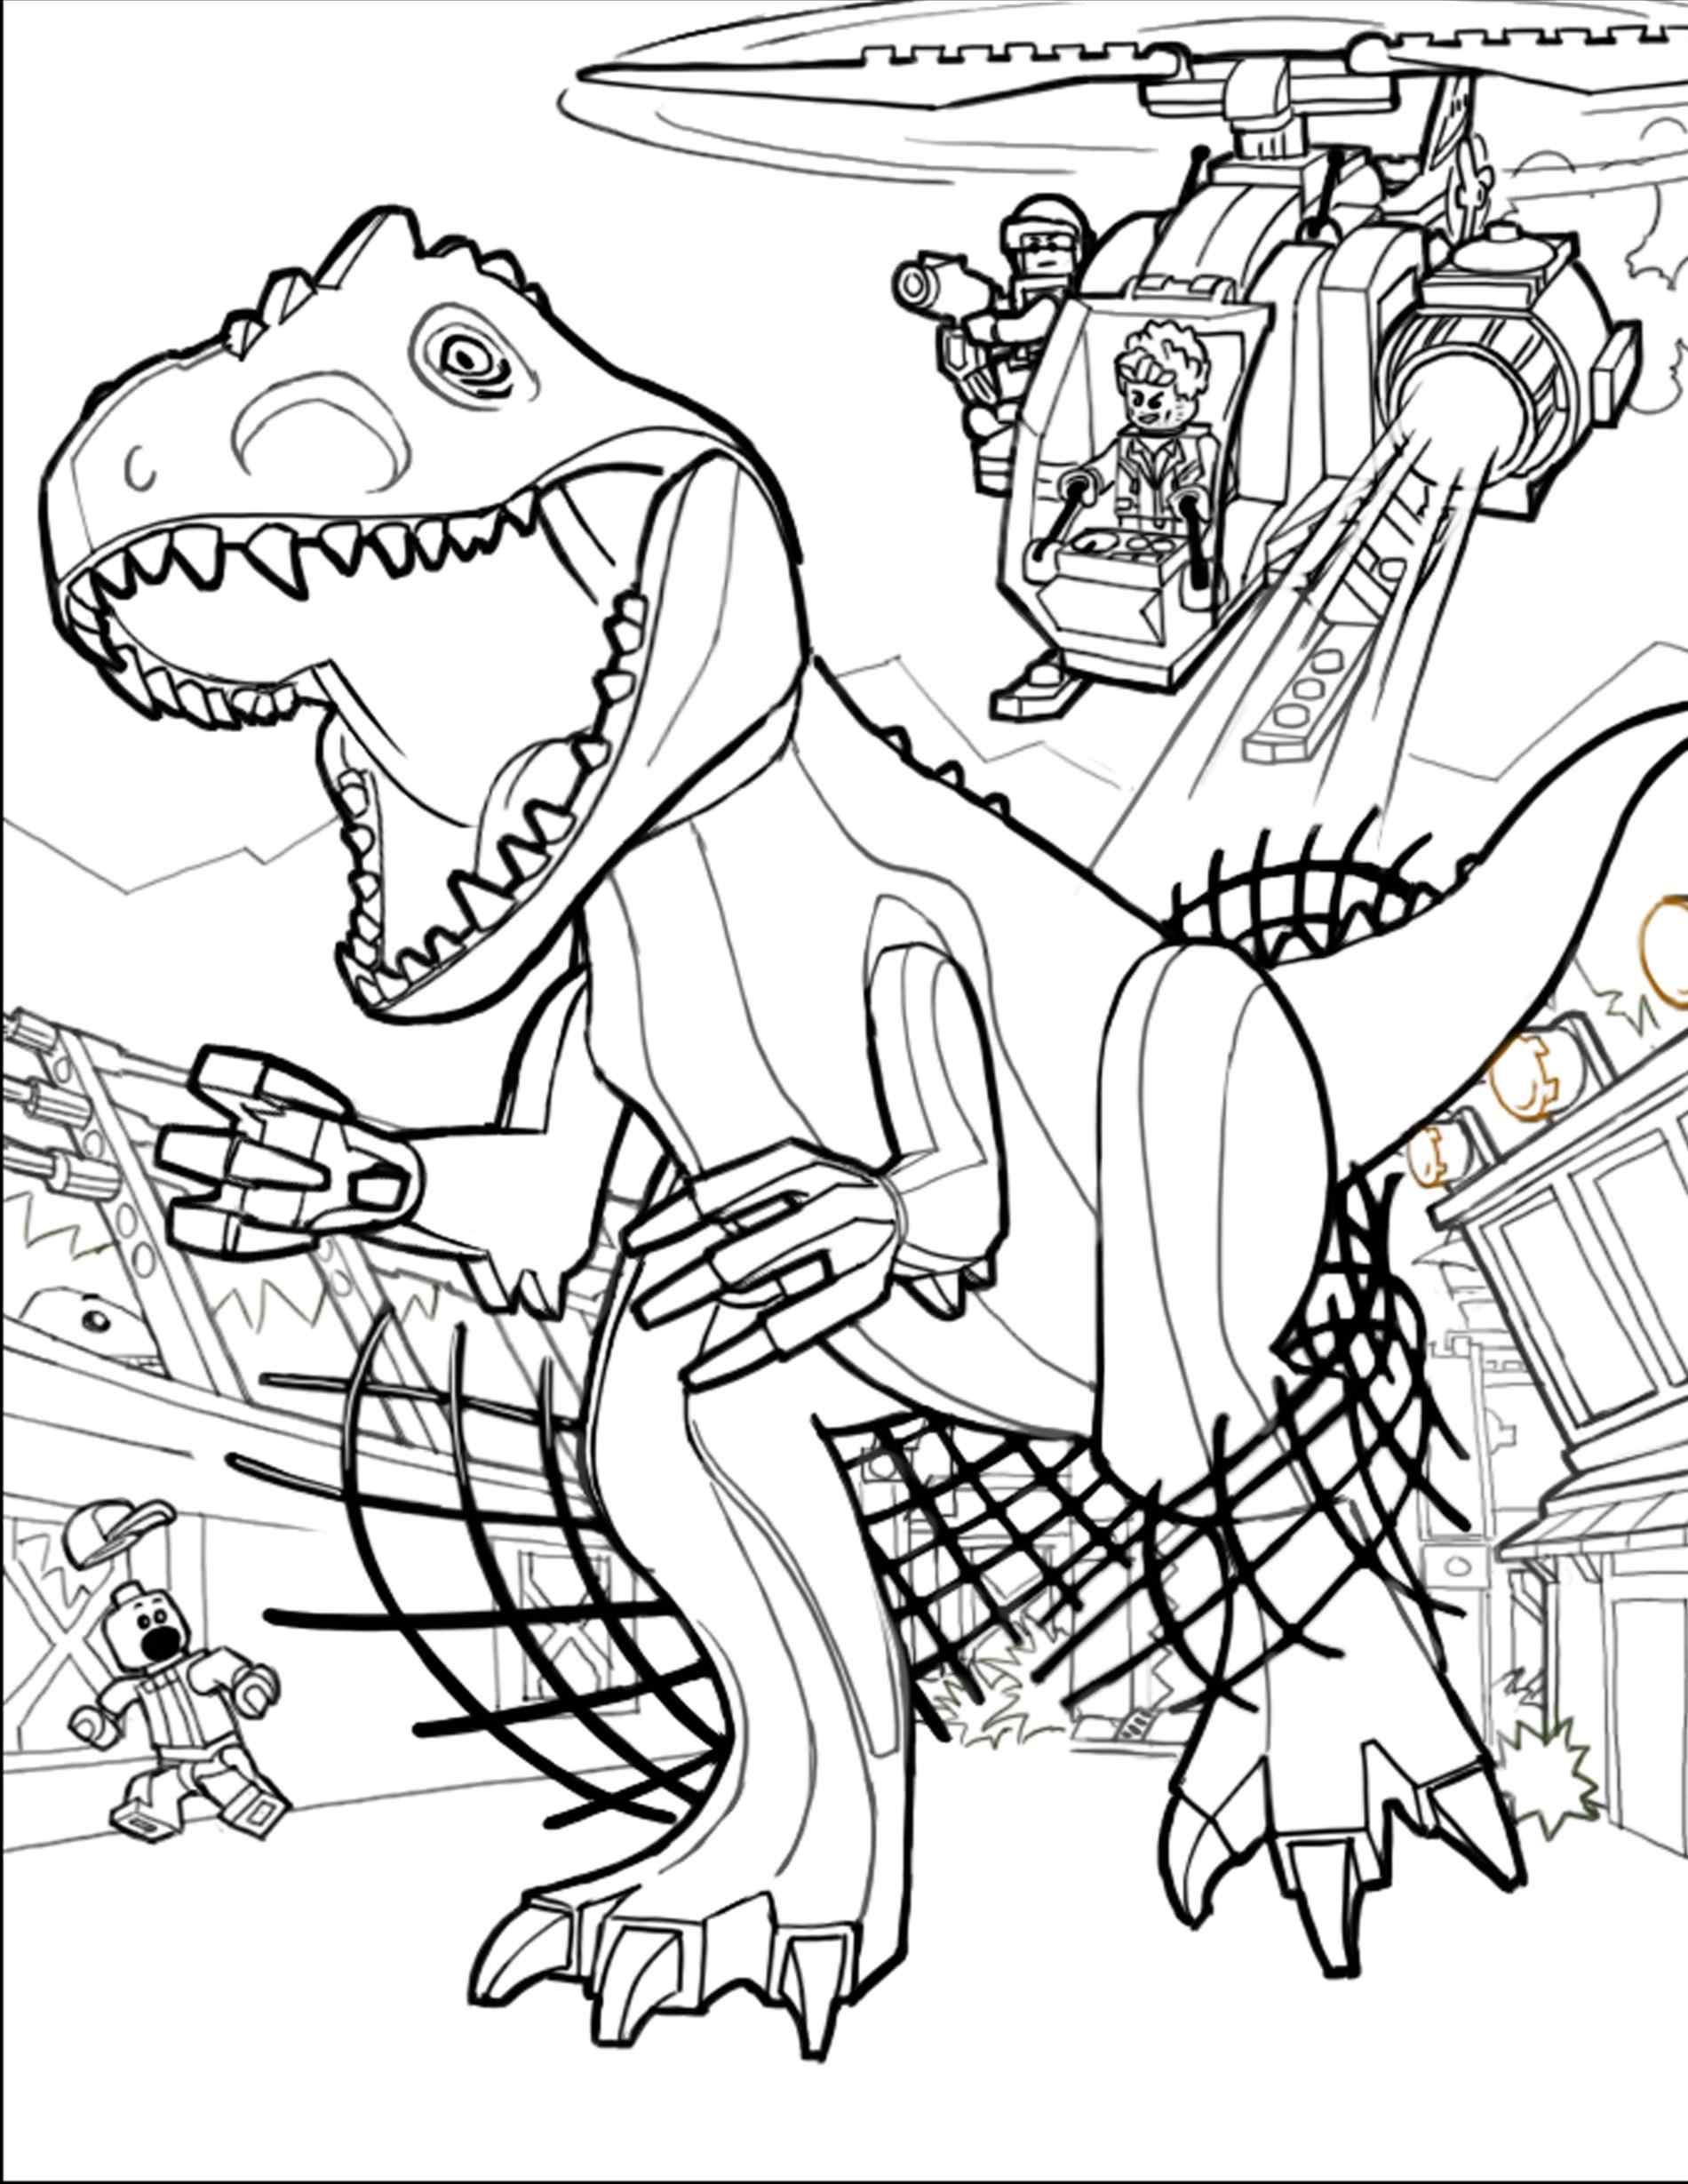 Jurassic World Indominus Rex Drawing at GetDrawings | Free ...